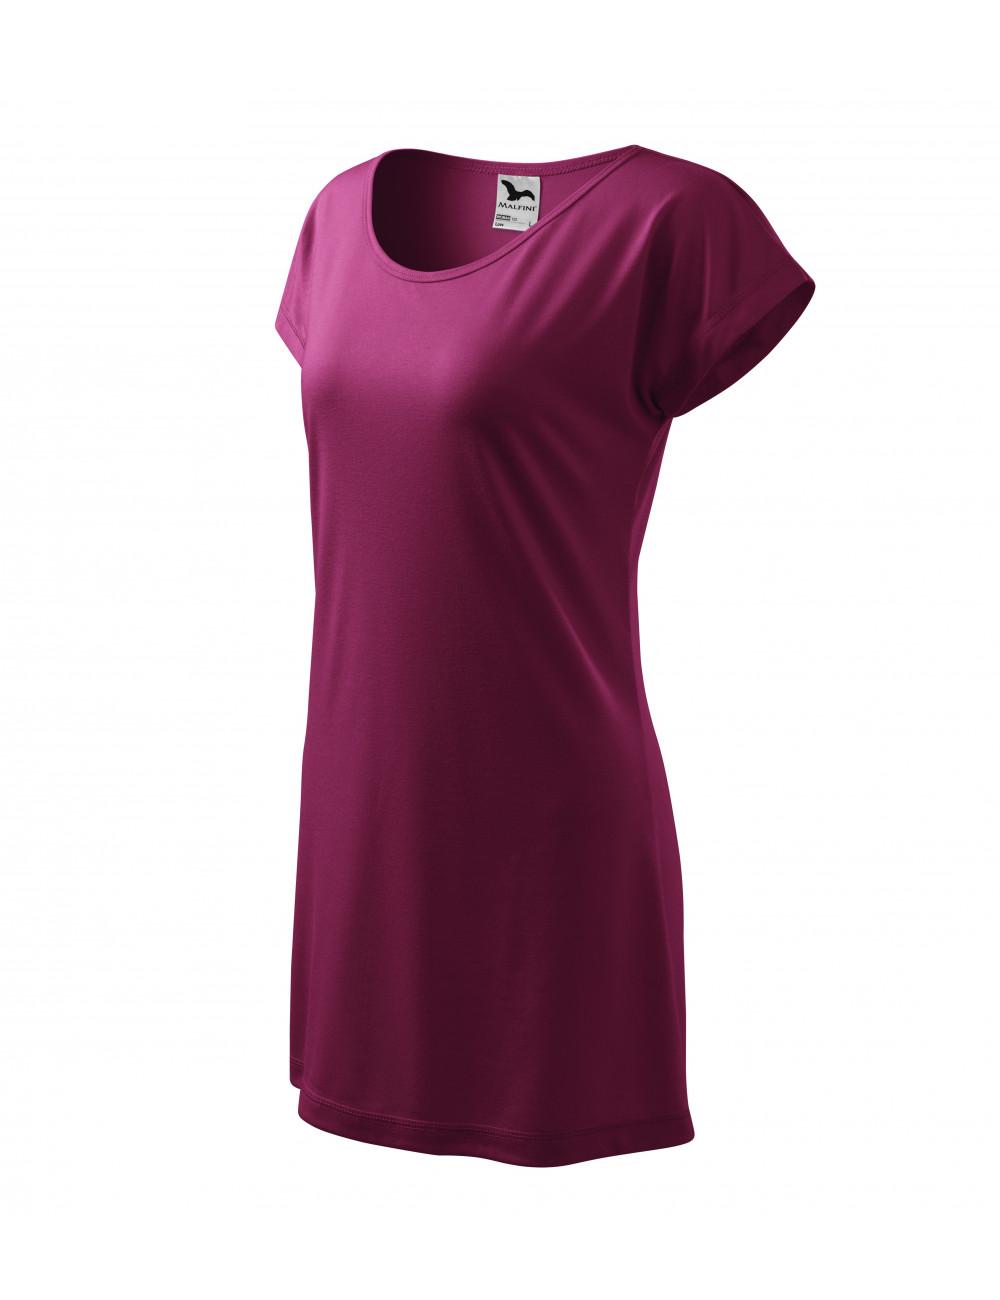 Adler MALFINI Koszulka/sukienka damska Love 123 uksjowy